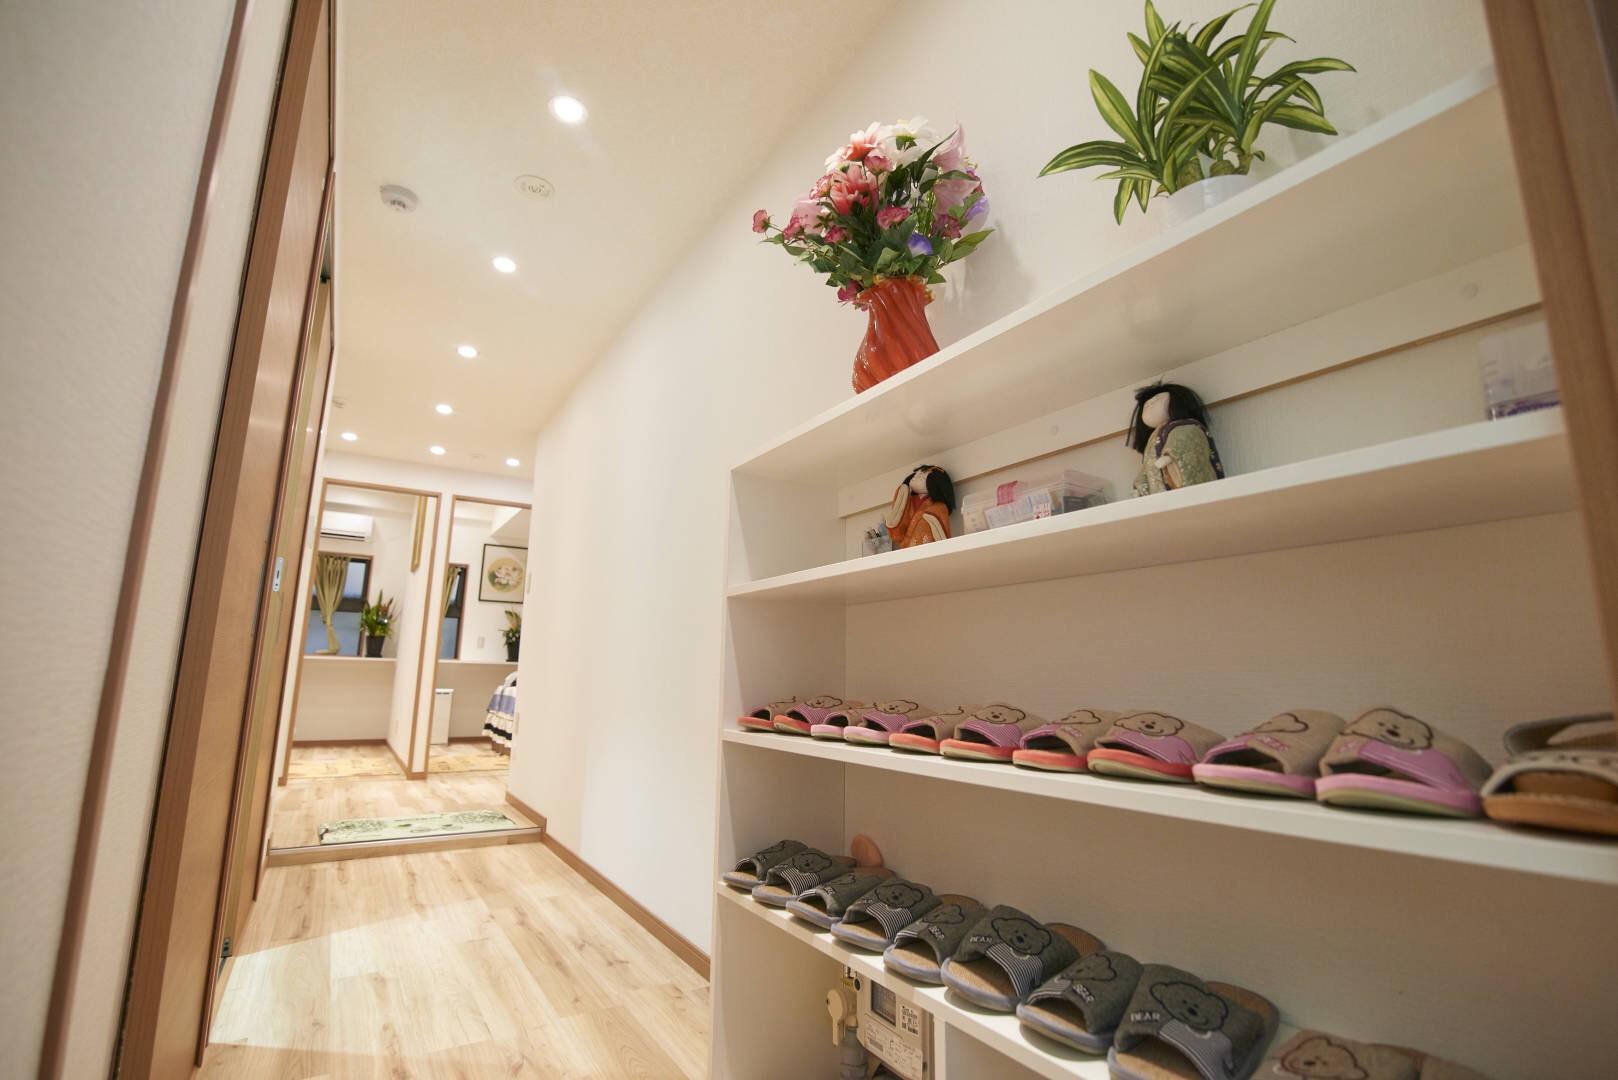 NEW OPEN Tokyo Central 3 Bedrooms 2 Bathrooms